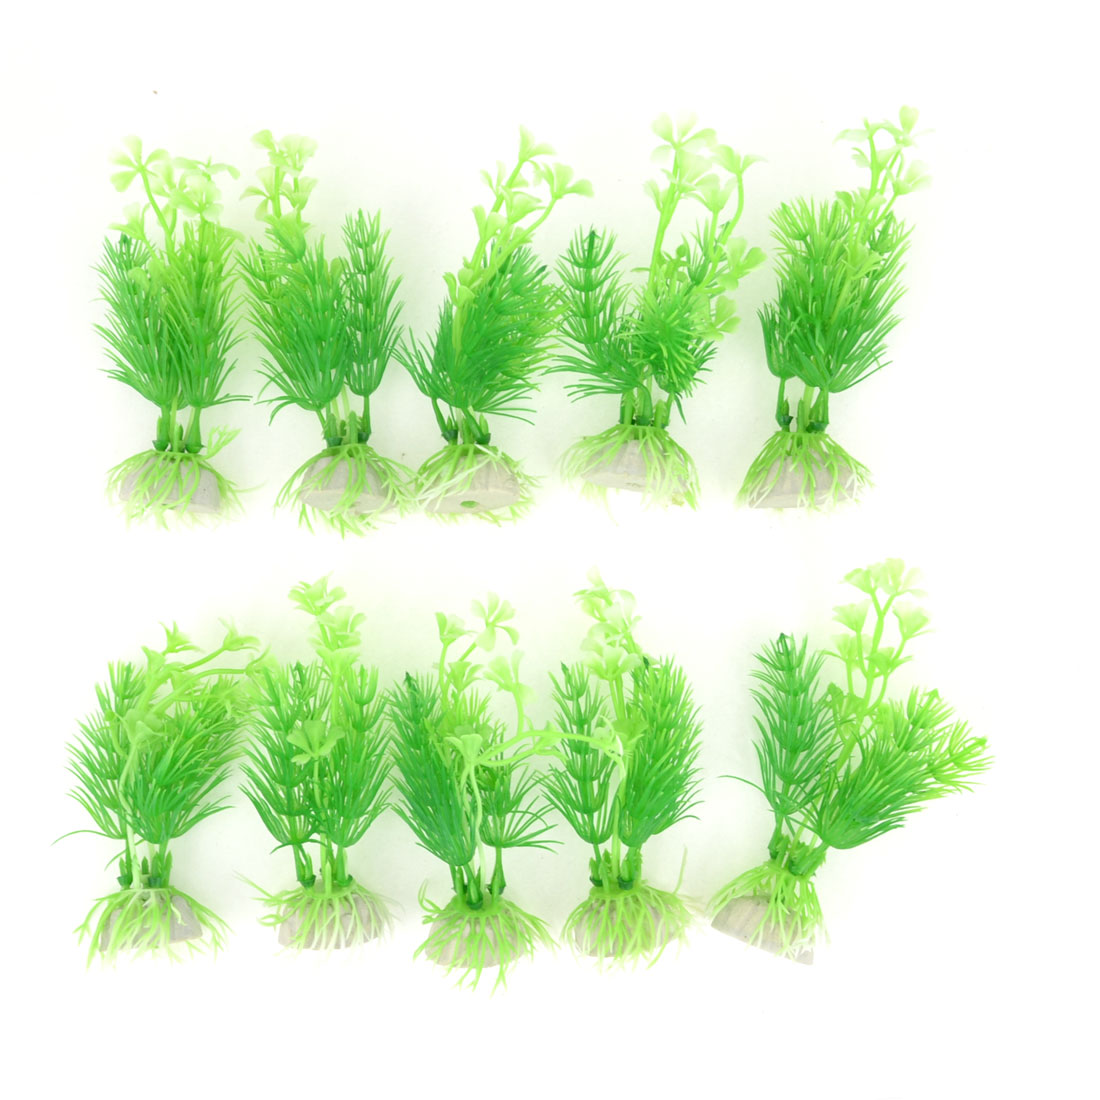 10pcs Aquarium 11.5cm High Green Needle Leaf Simulated Aquatic Plant